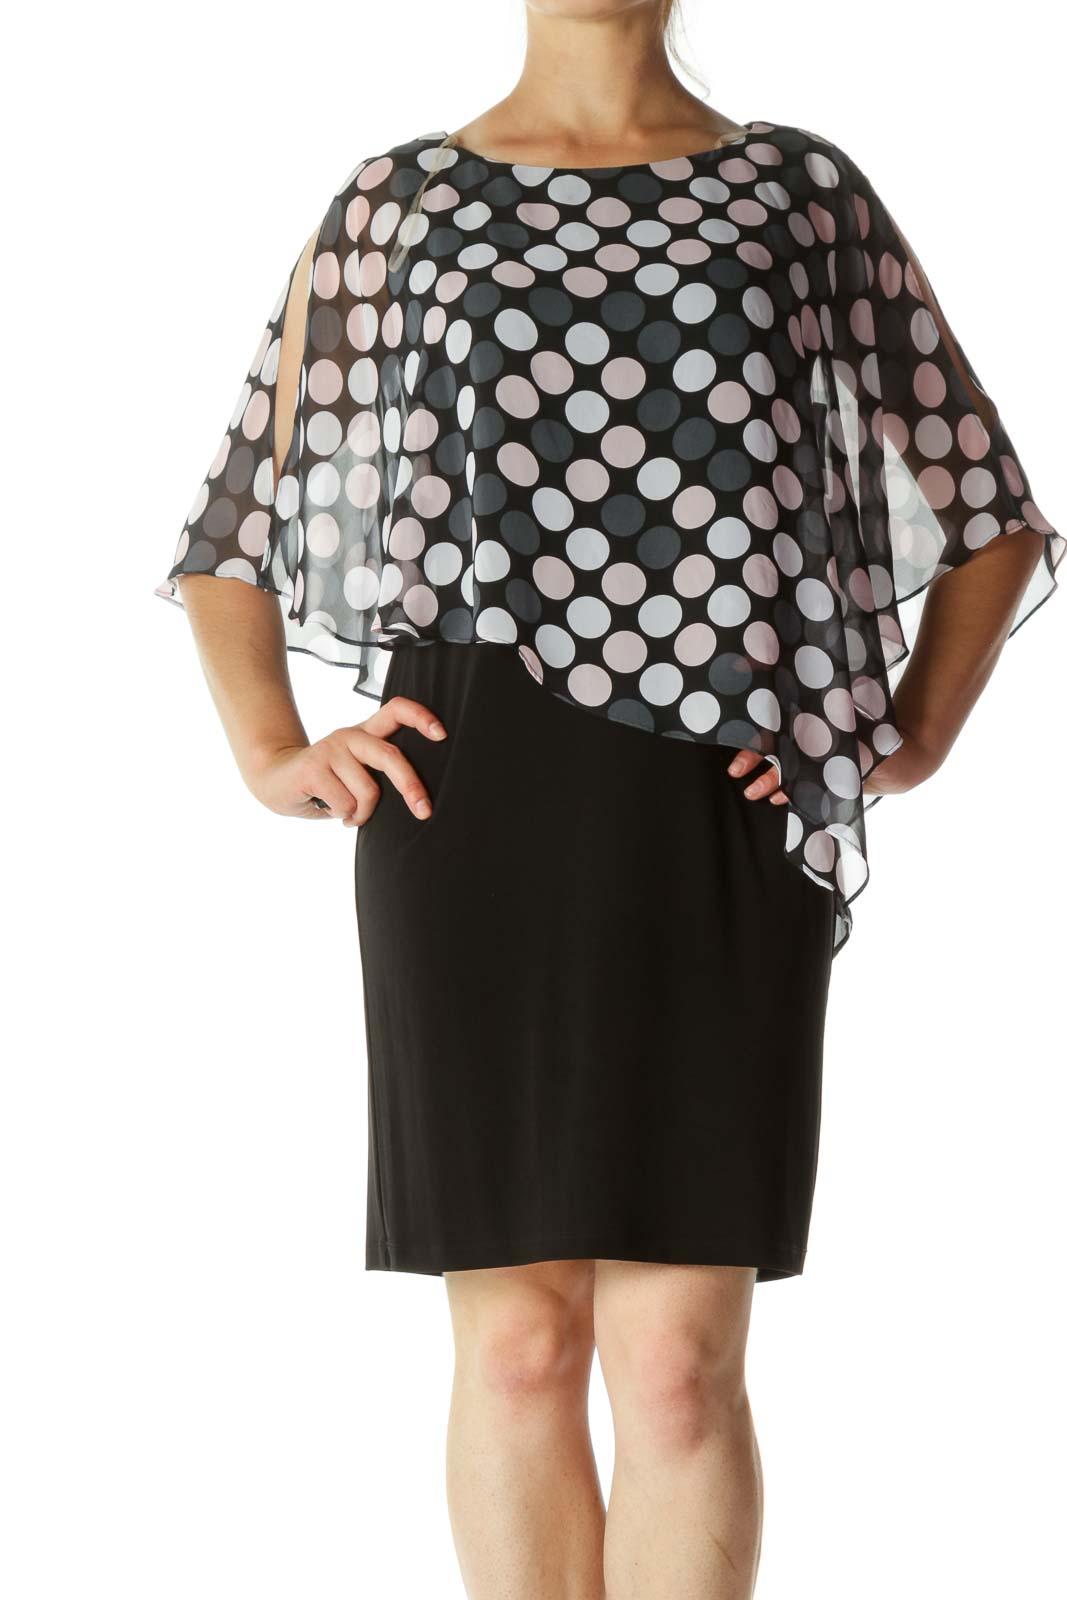 Black And Pink Polka Dots Cape Shirt Dress Front